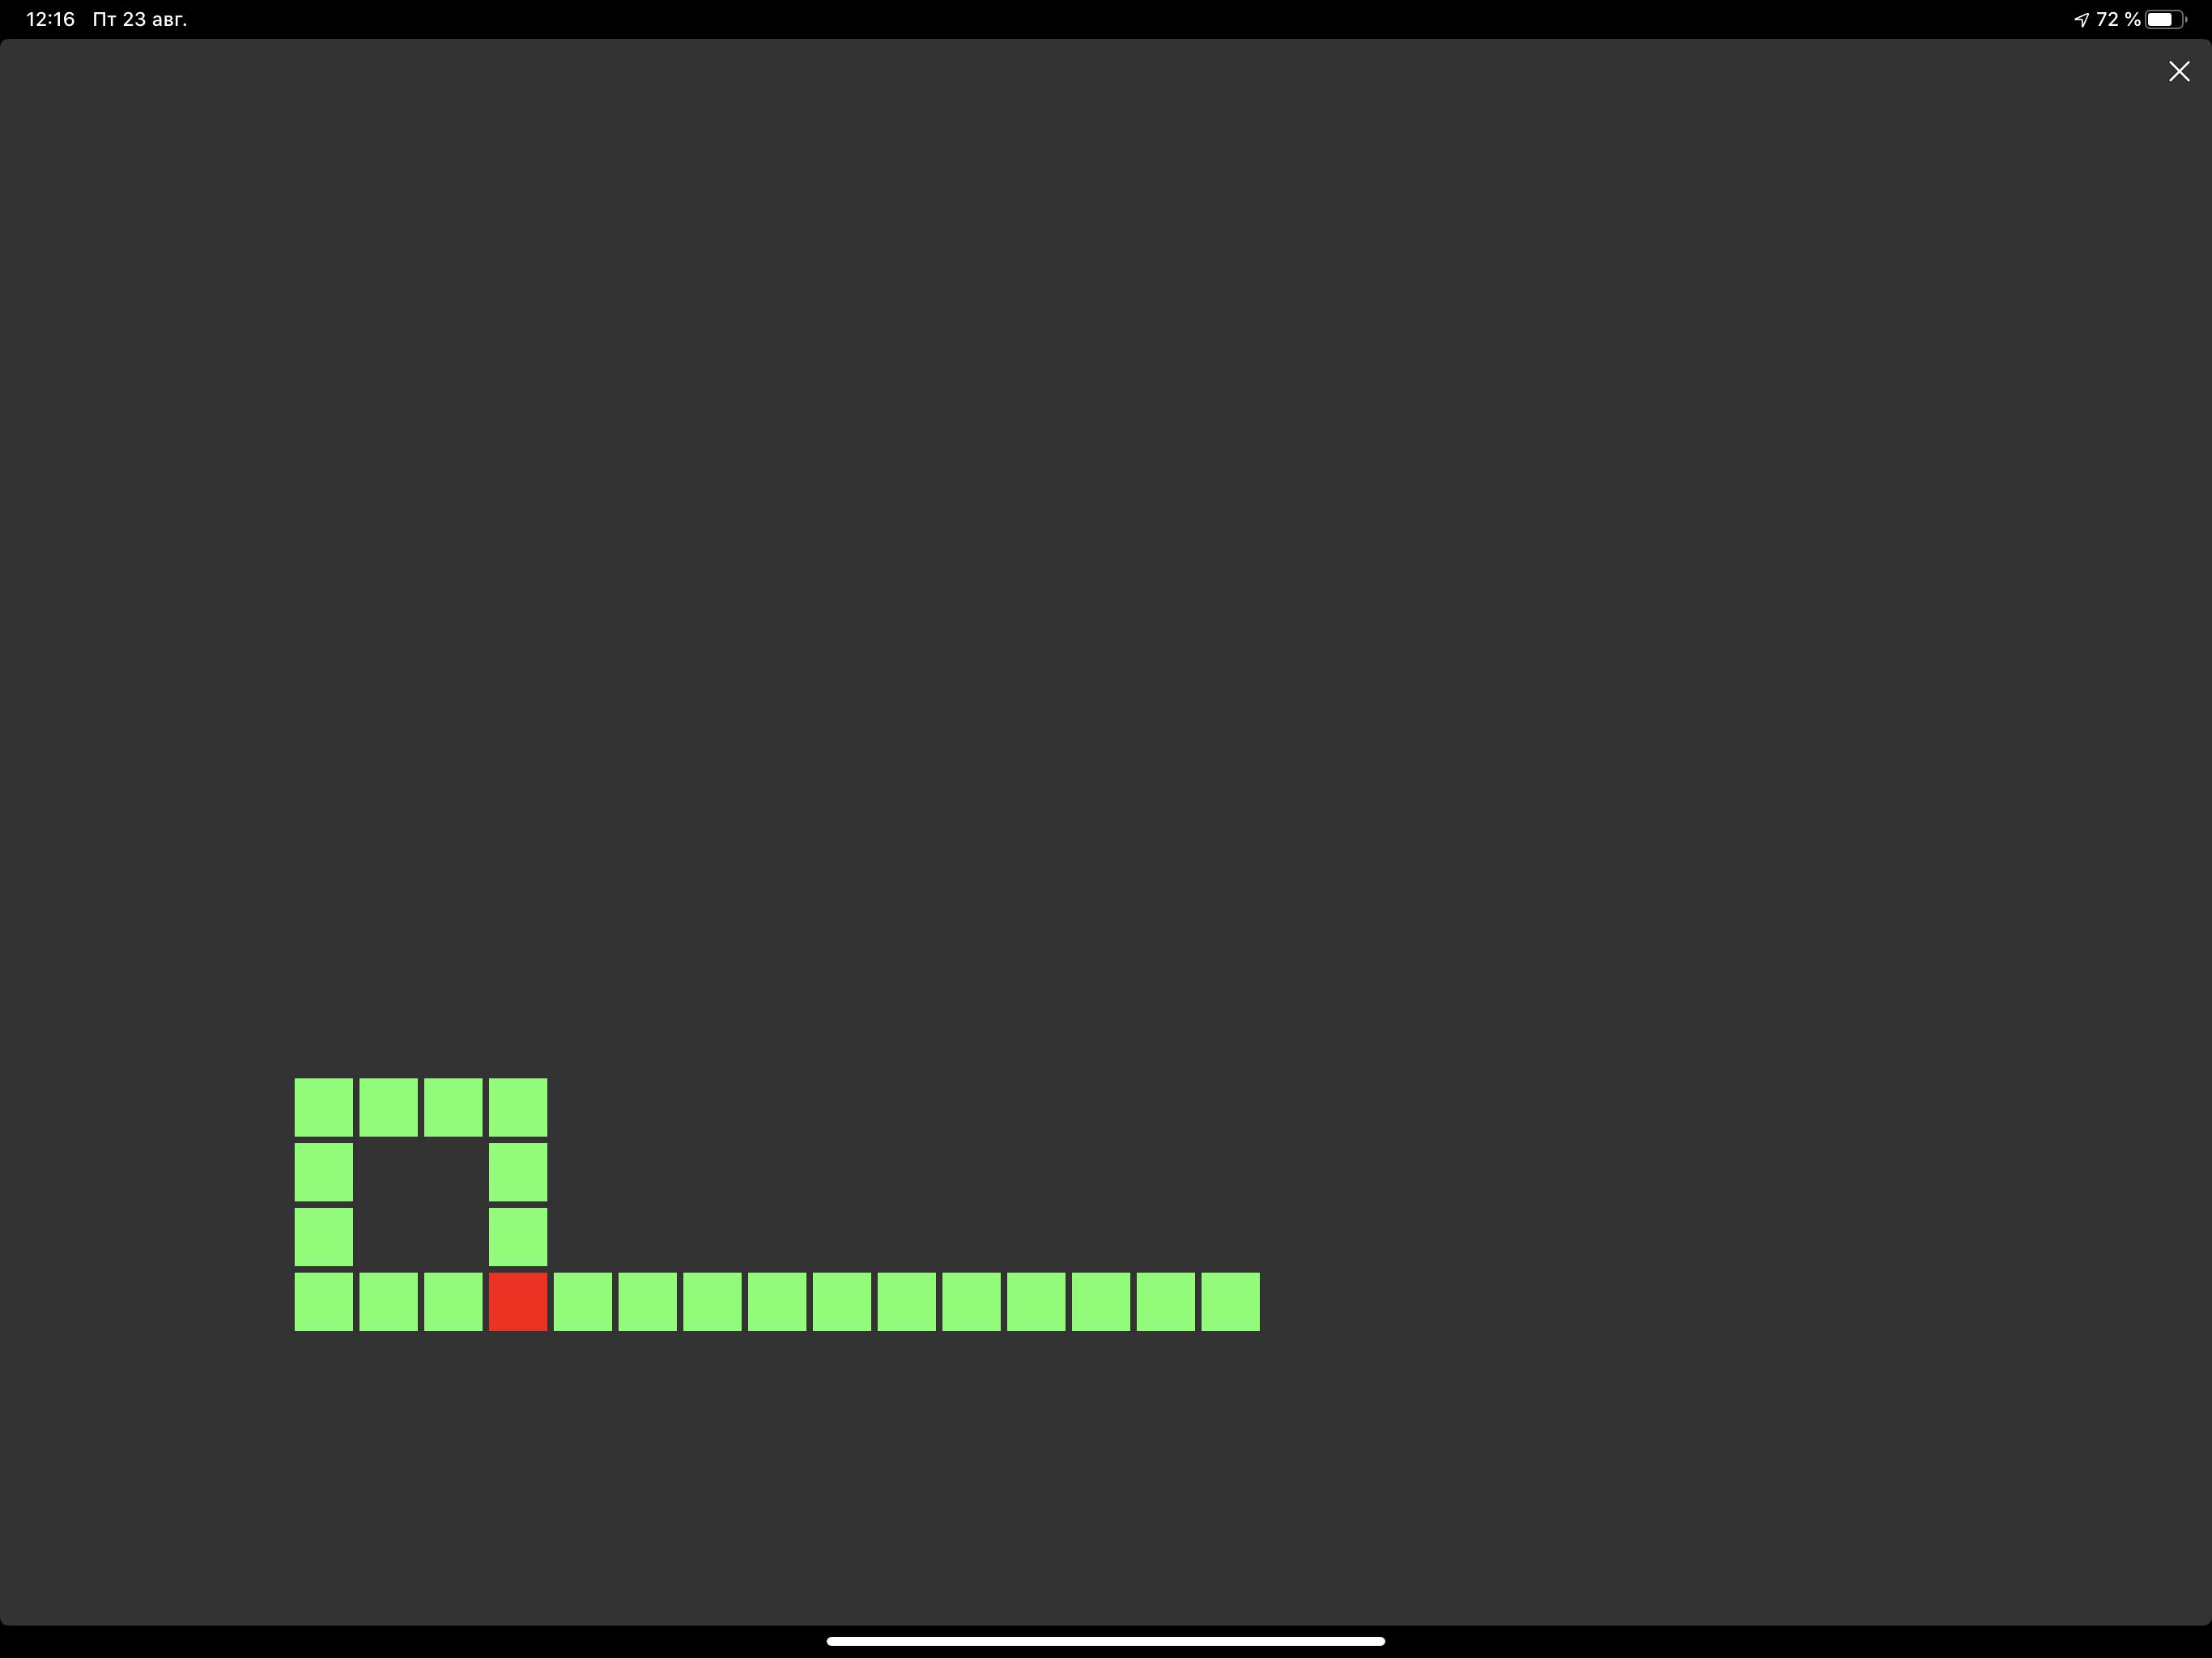 Написание змейки на ipad (pythonista) - 14